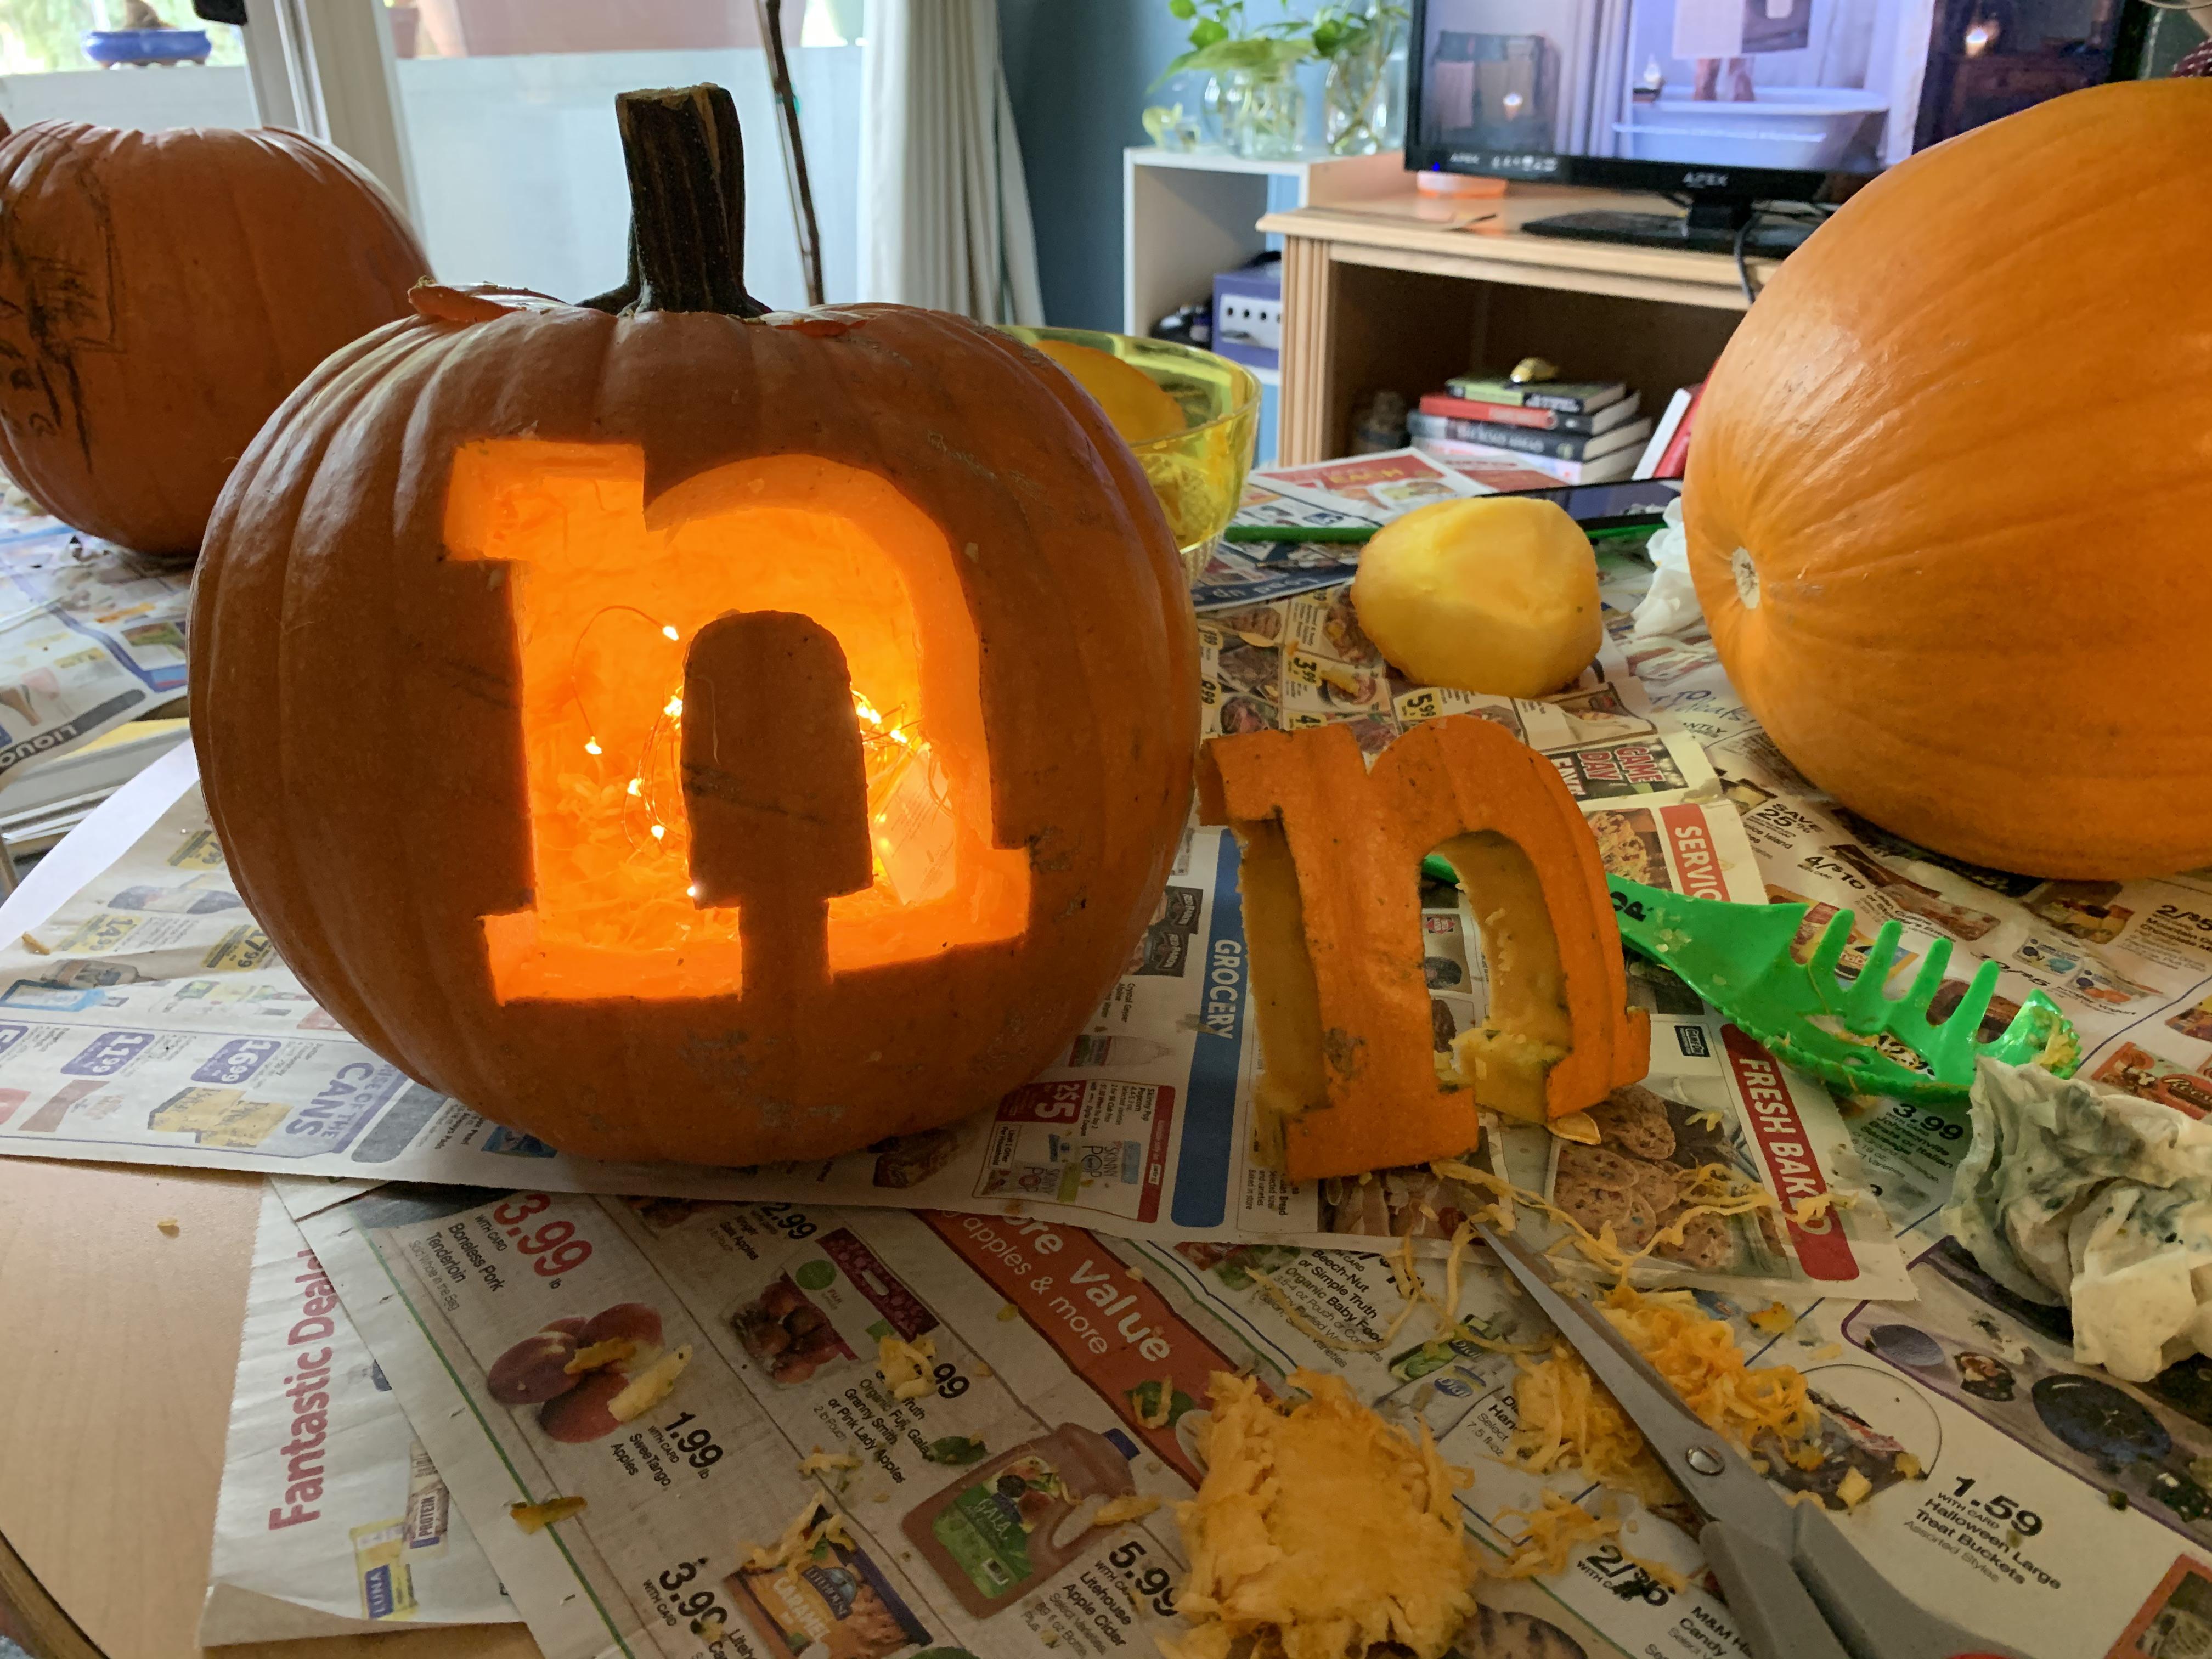 The Nectir logo carved into a Halloween pumpkin.